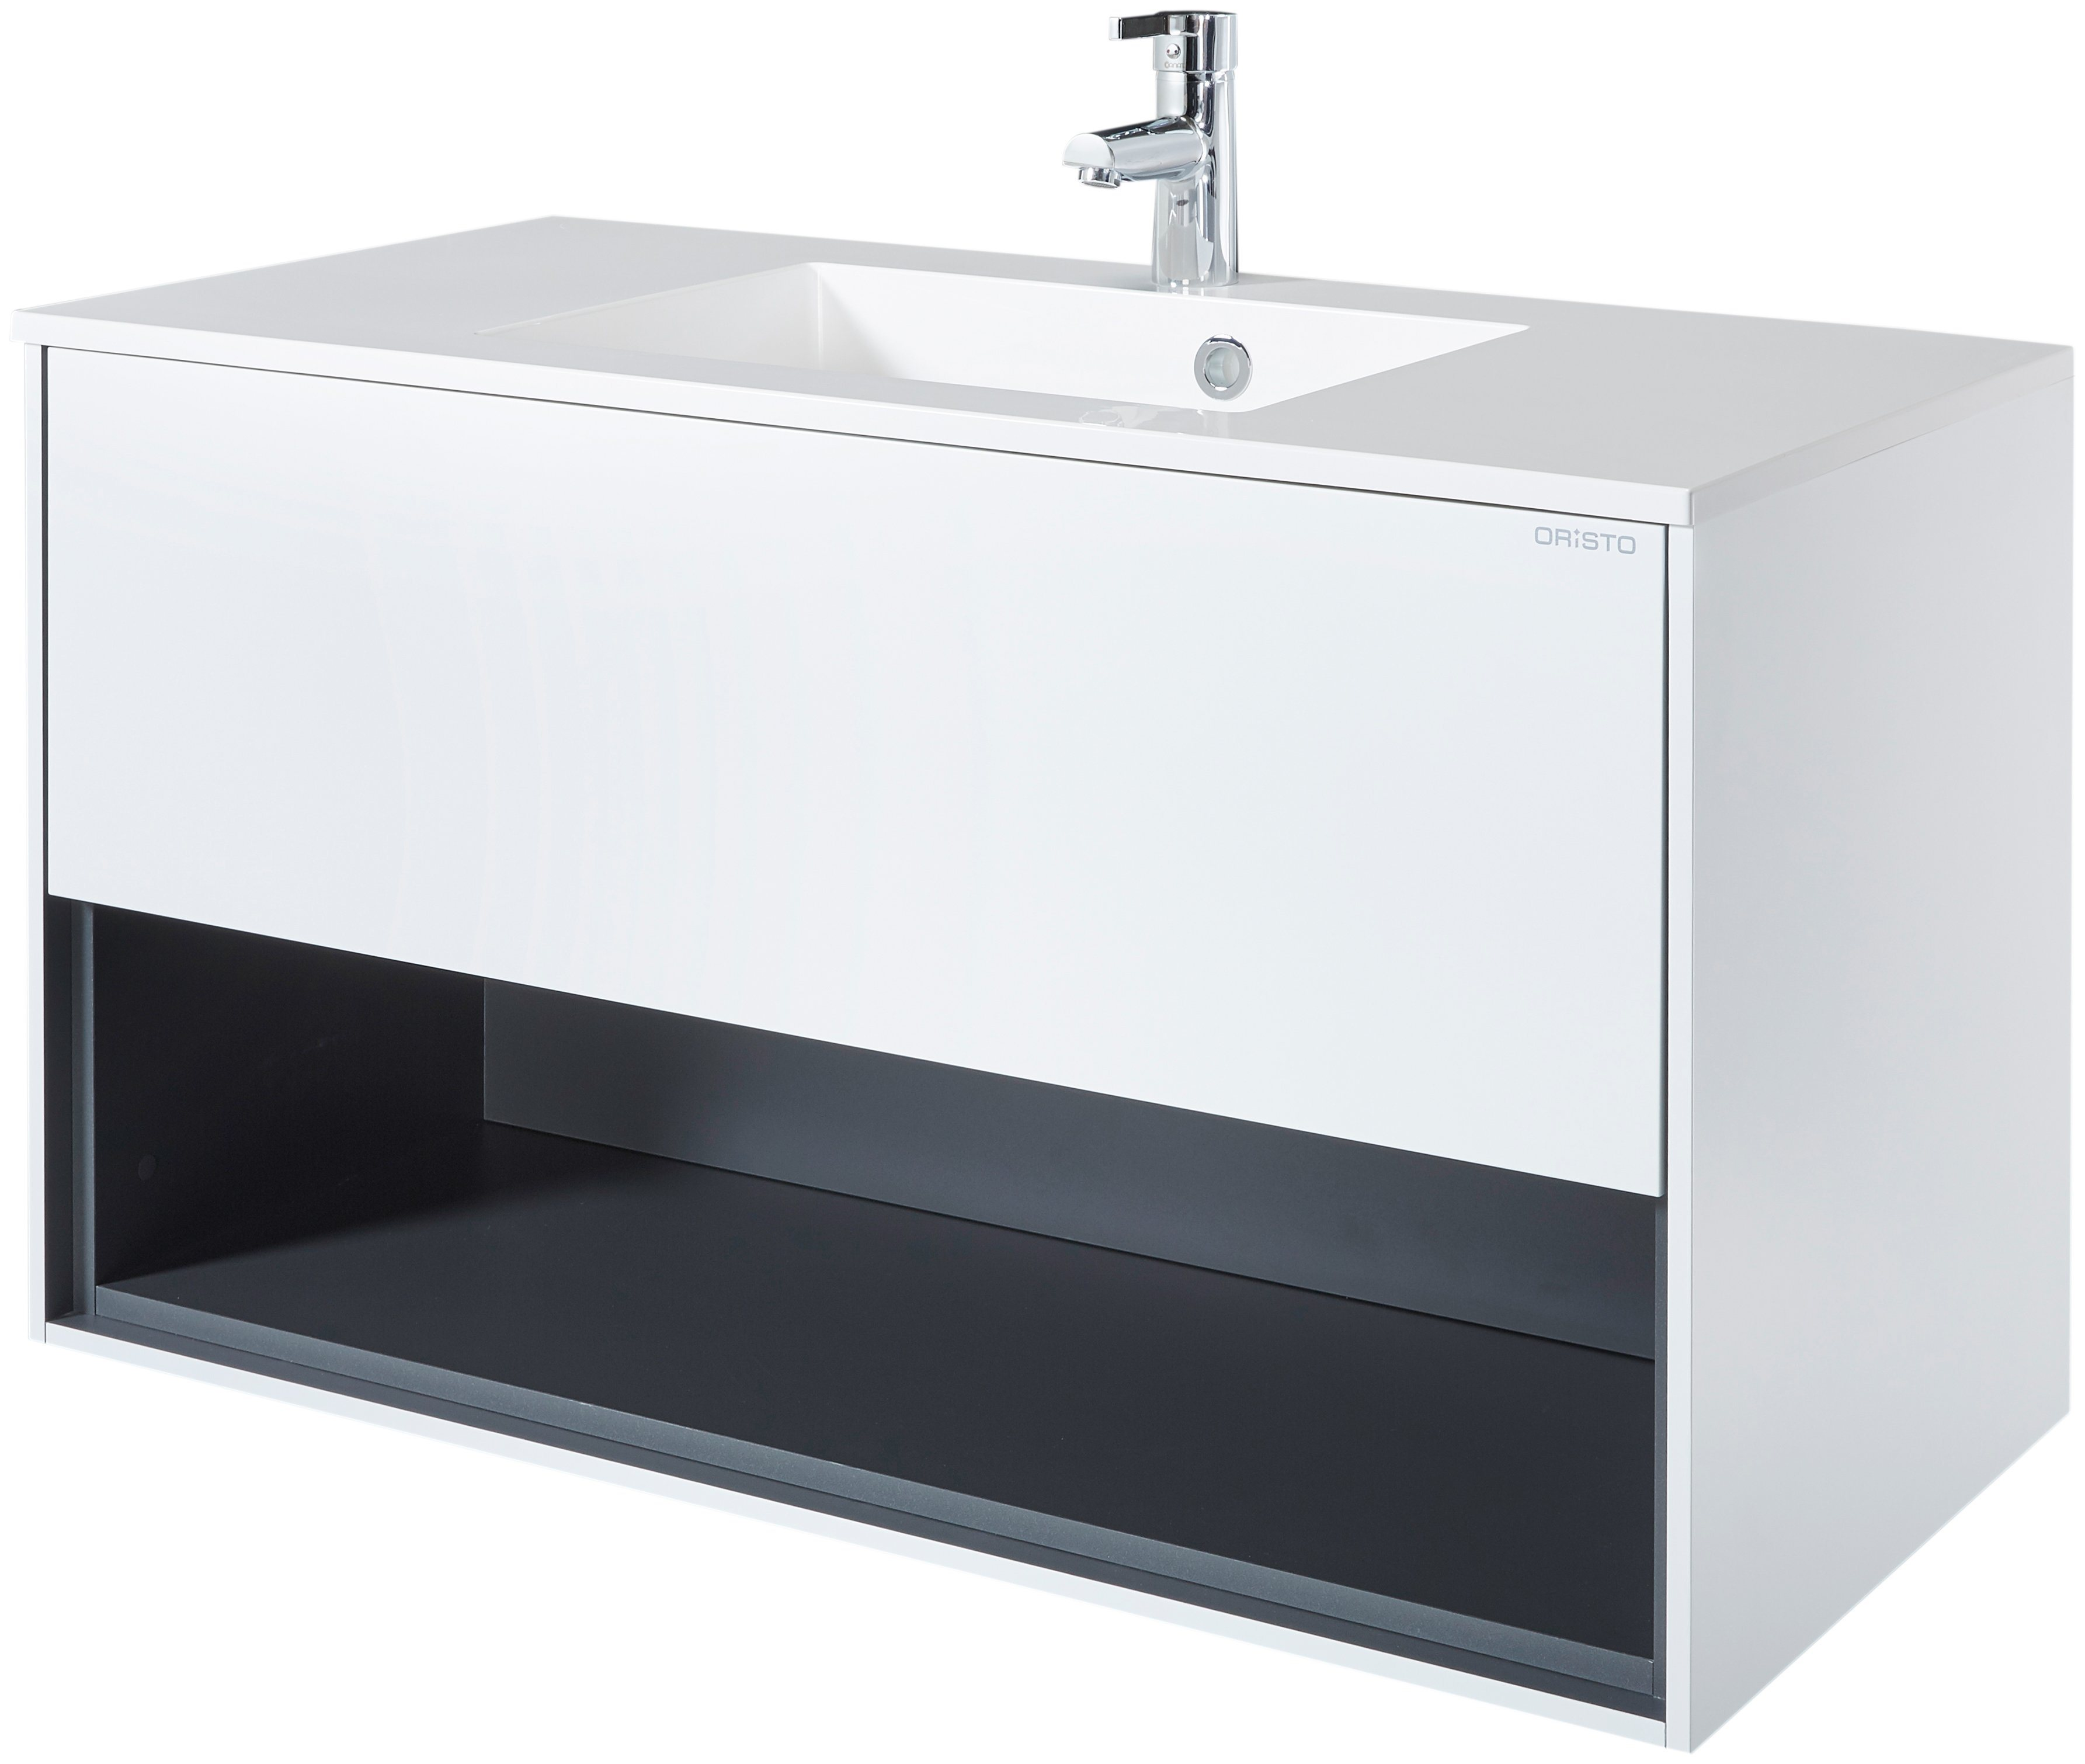 oristo badm bel sets online kaufen m bel suchmaschine. Black Bedroom Furniture Sets. Home Design Ideas